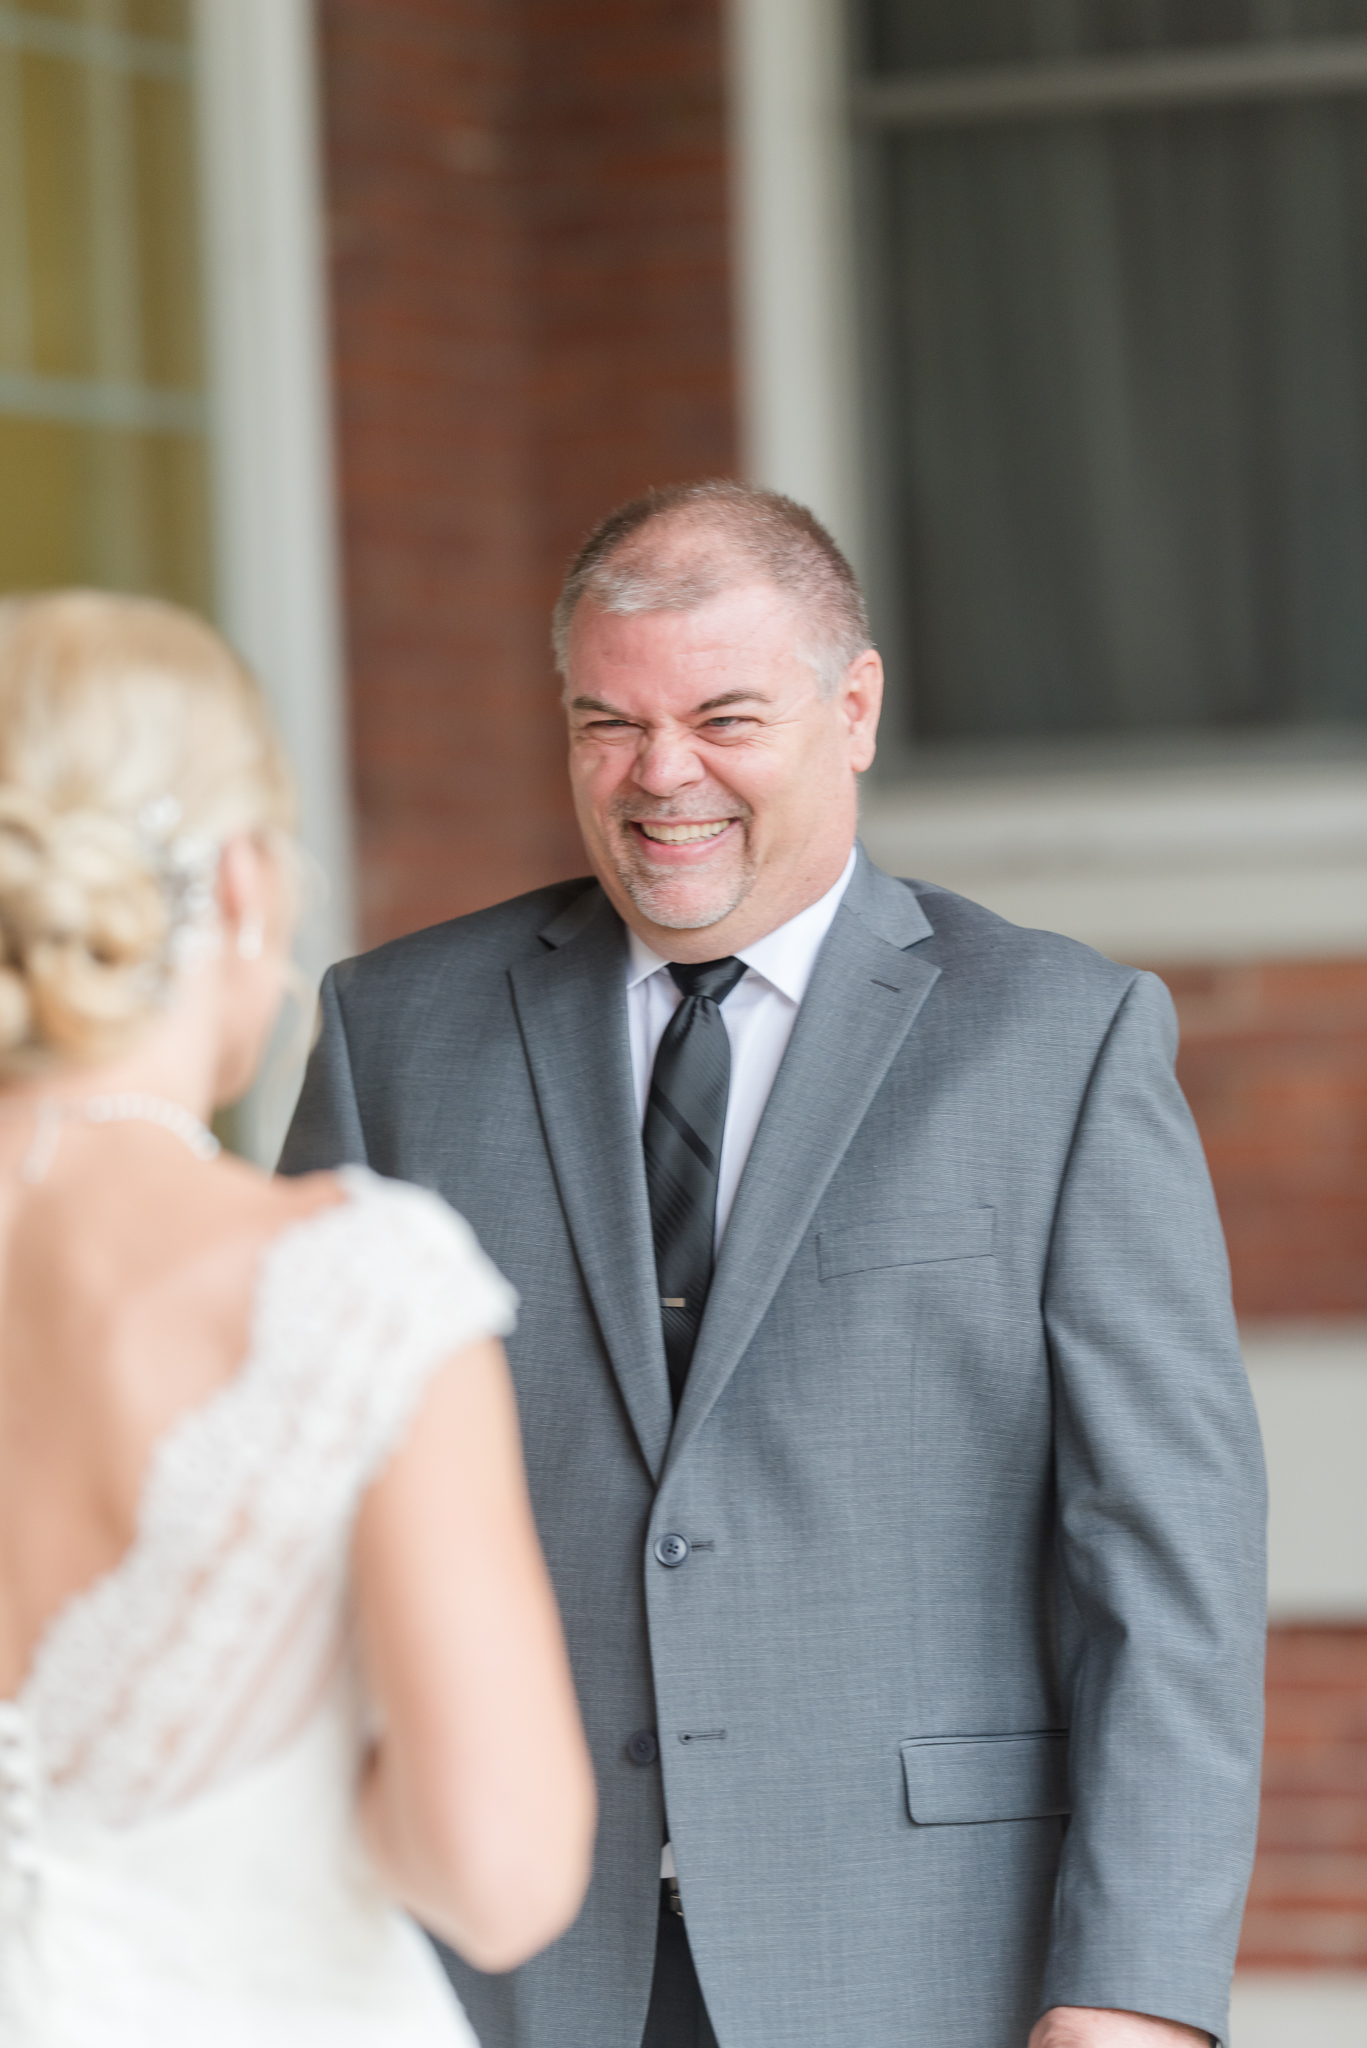 Westminister Hall Wedding Winona Lake Indiana8272.jpg